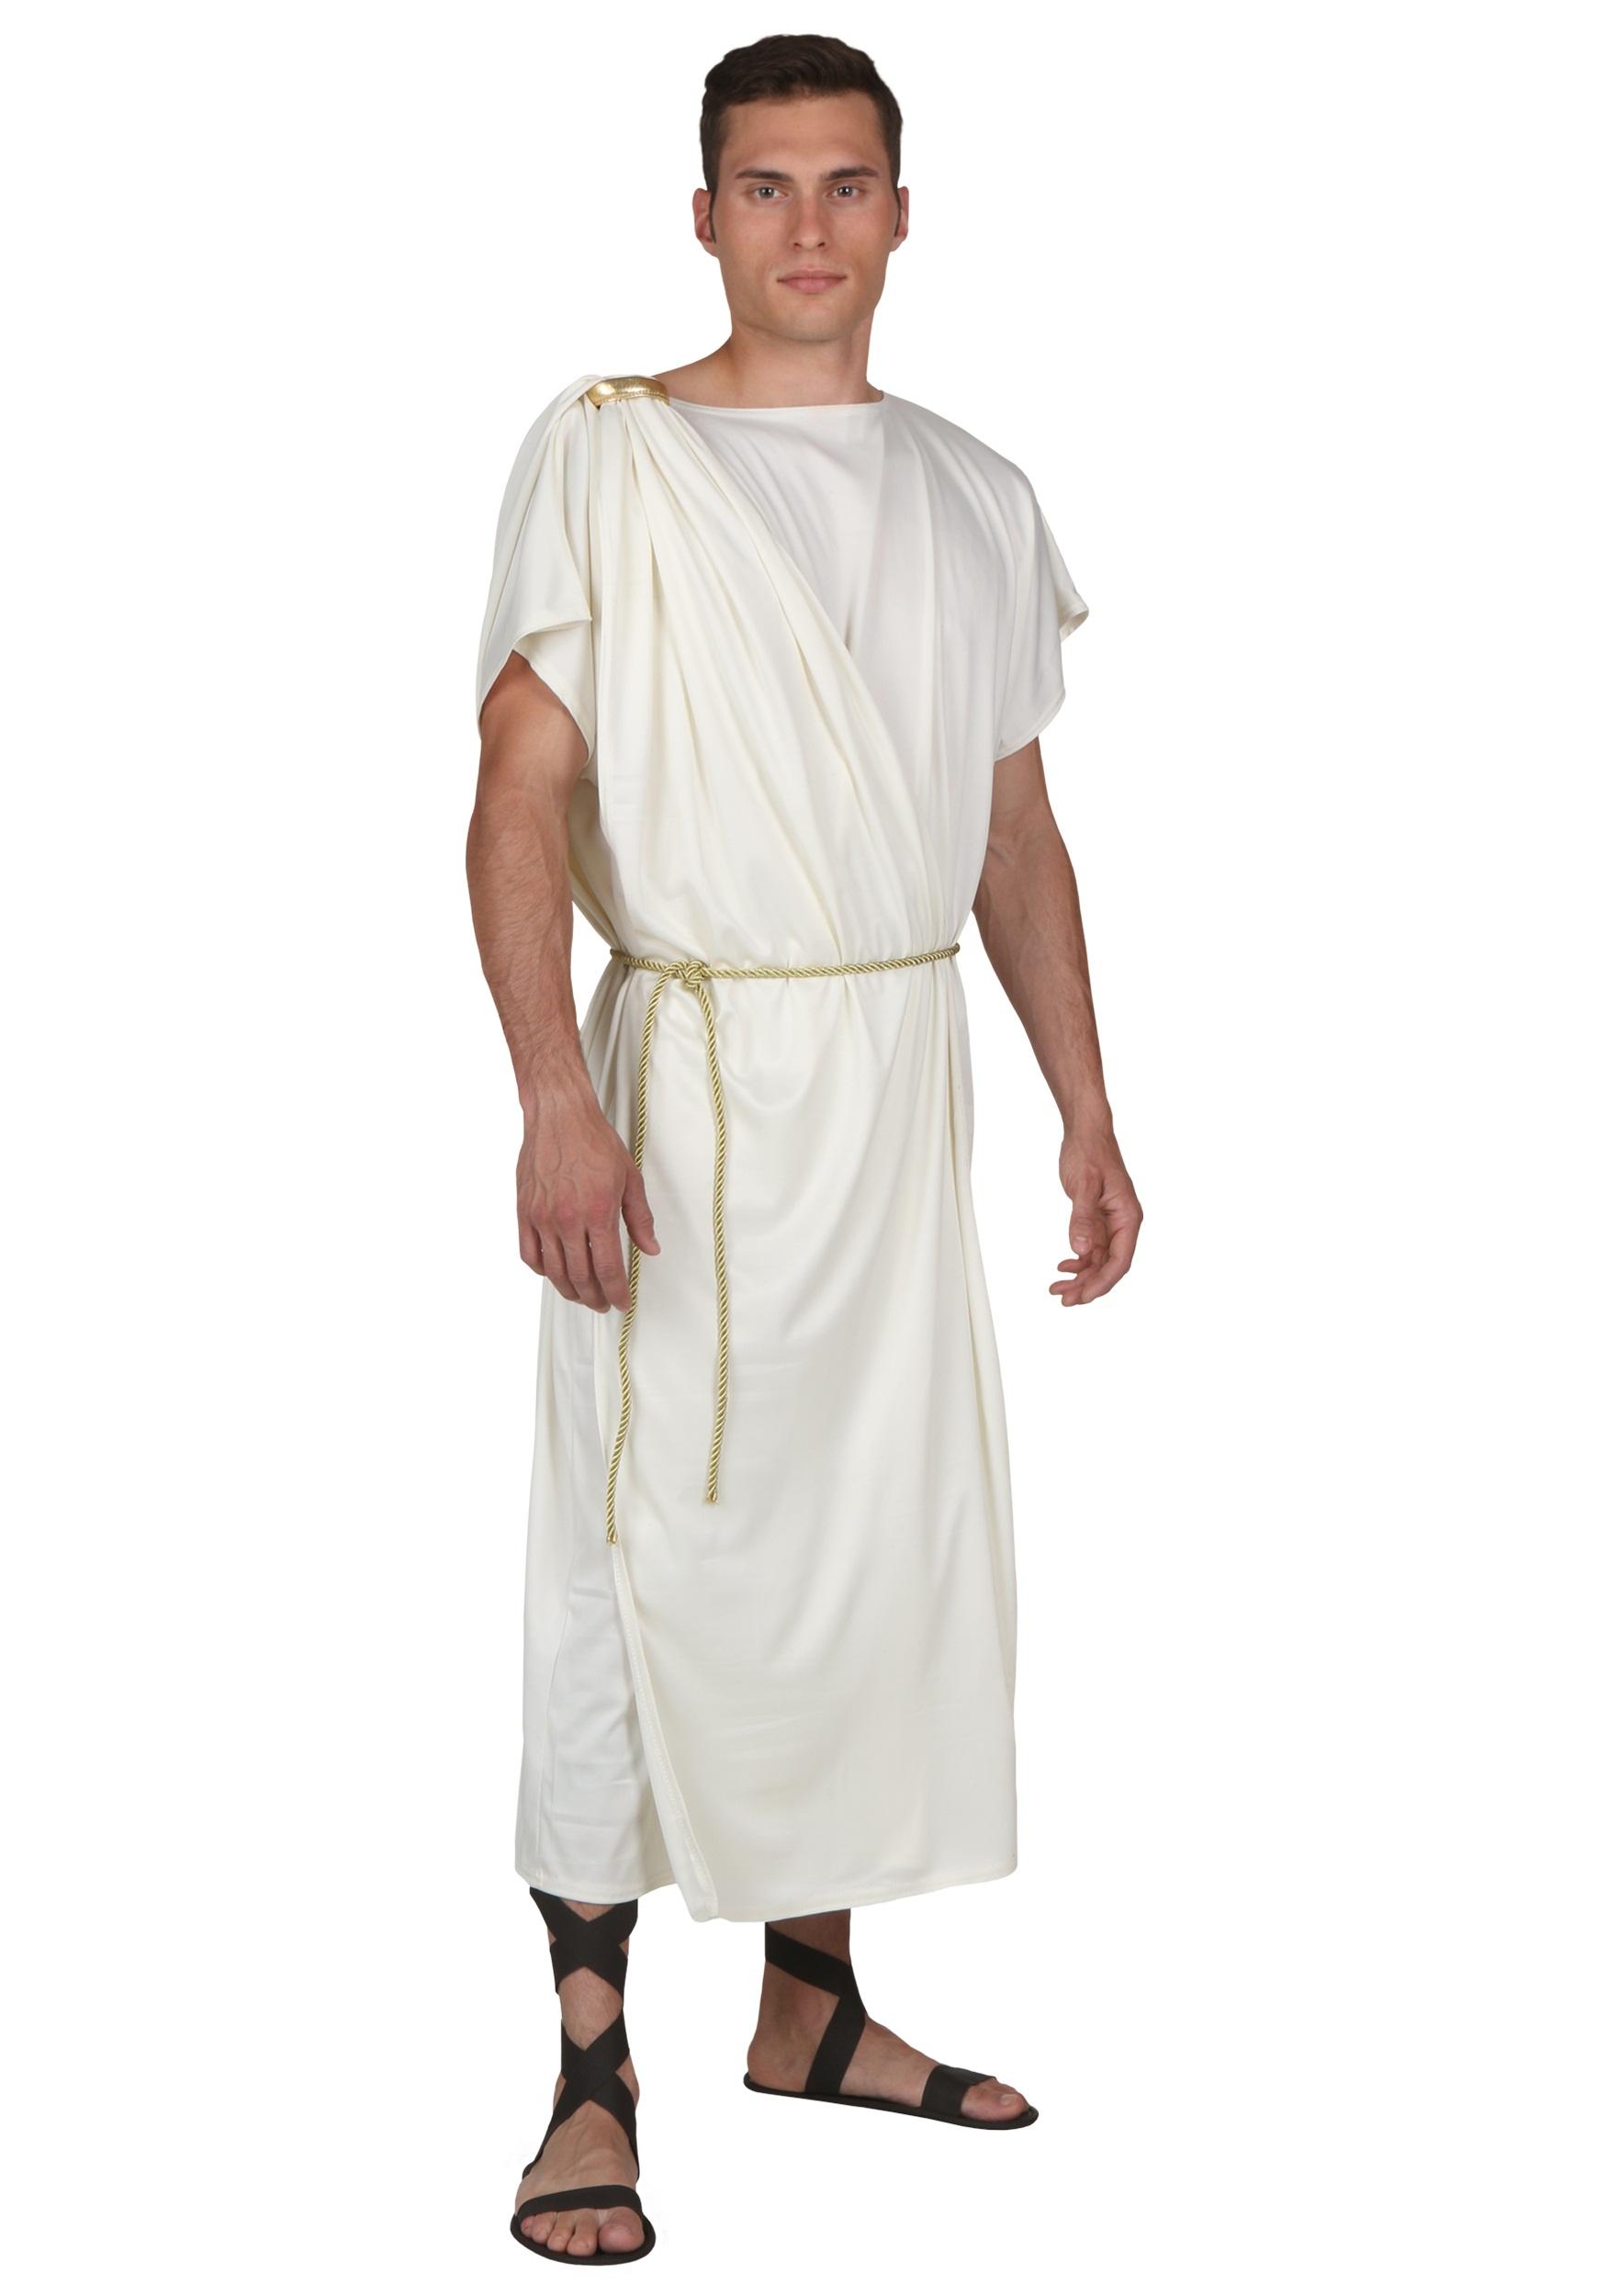 Toga halloween costume for men mens toga solutioingenieria Gallery